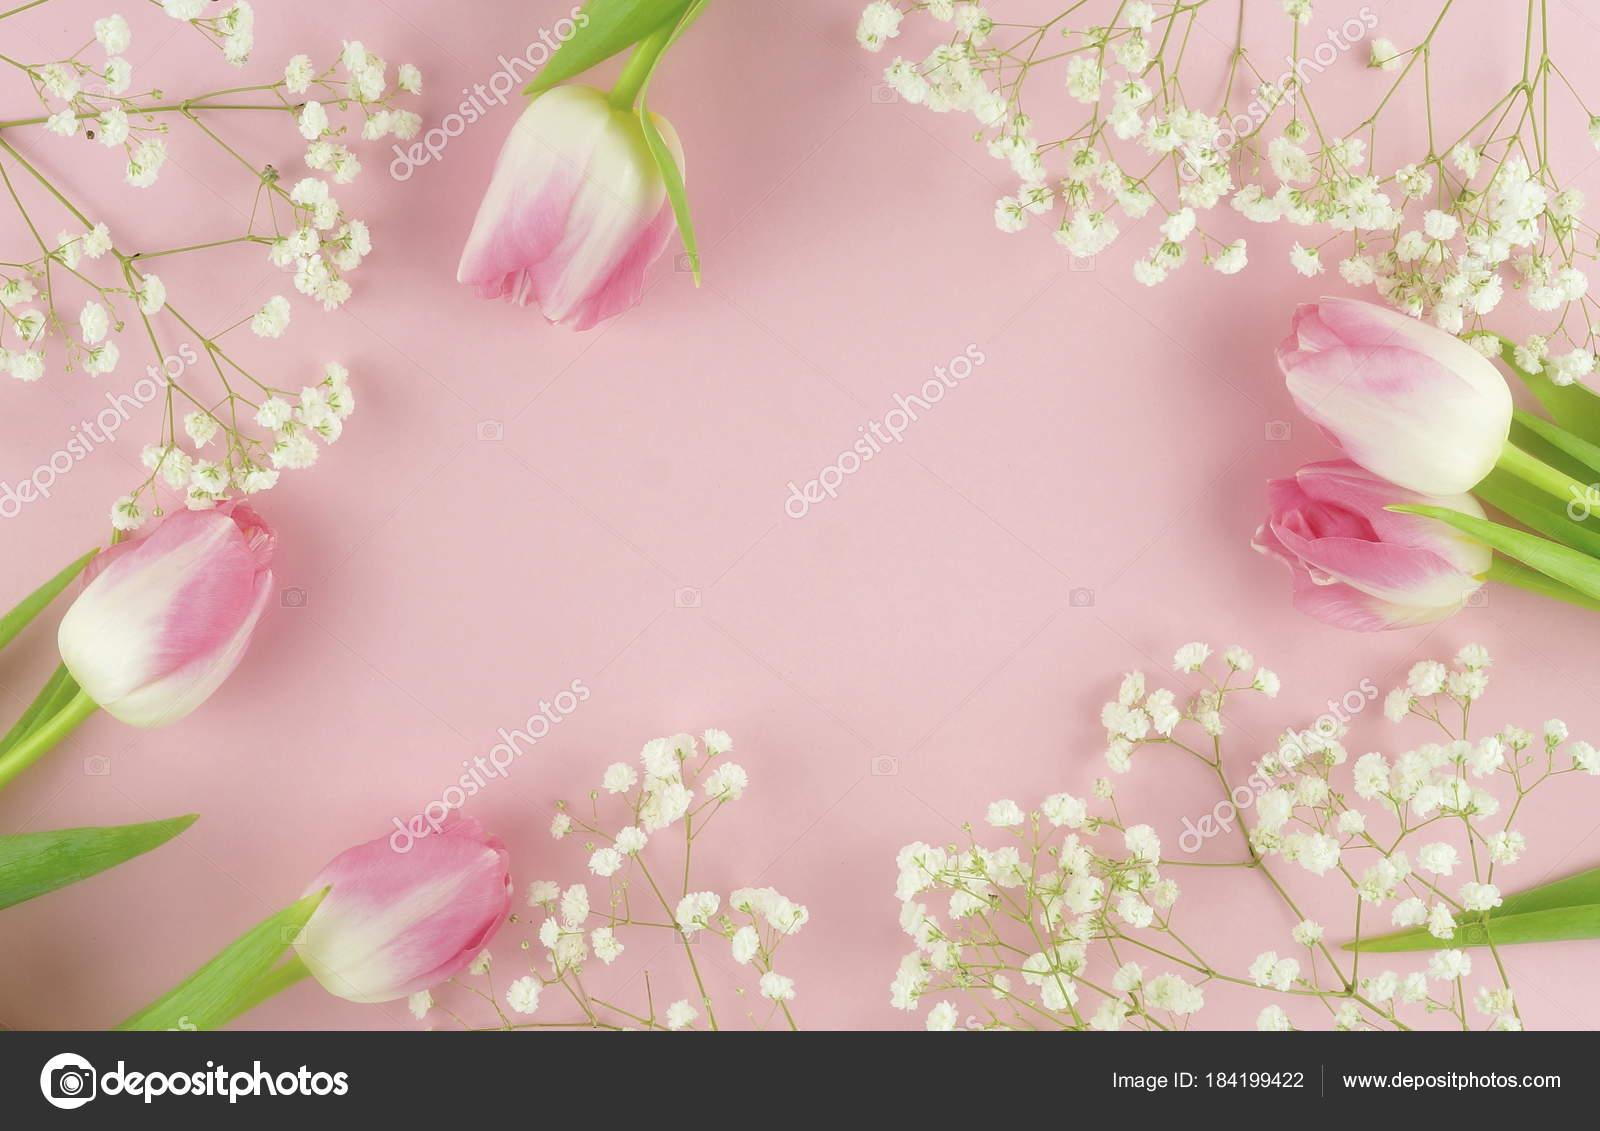 Flower Frame Arrangement Pink Tulips White Flowers Pale Pink